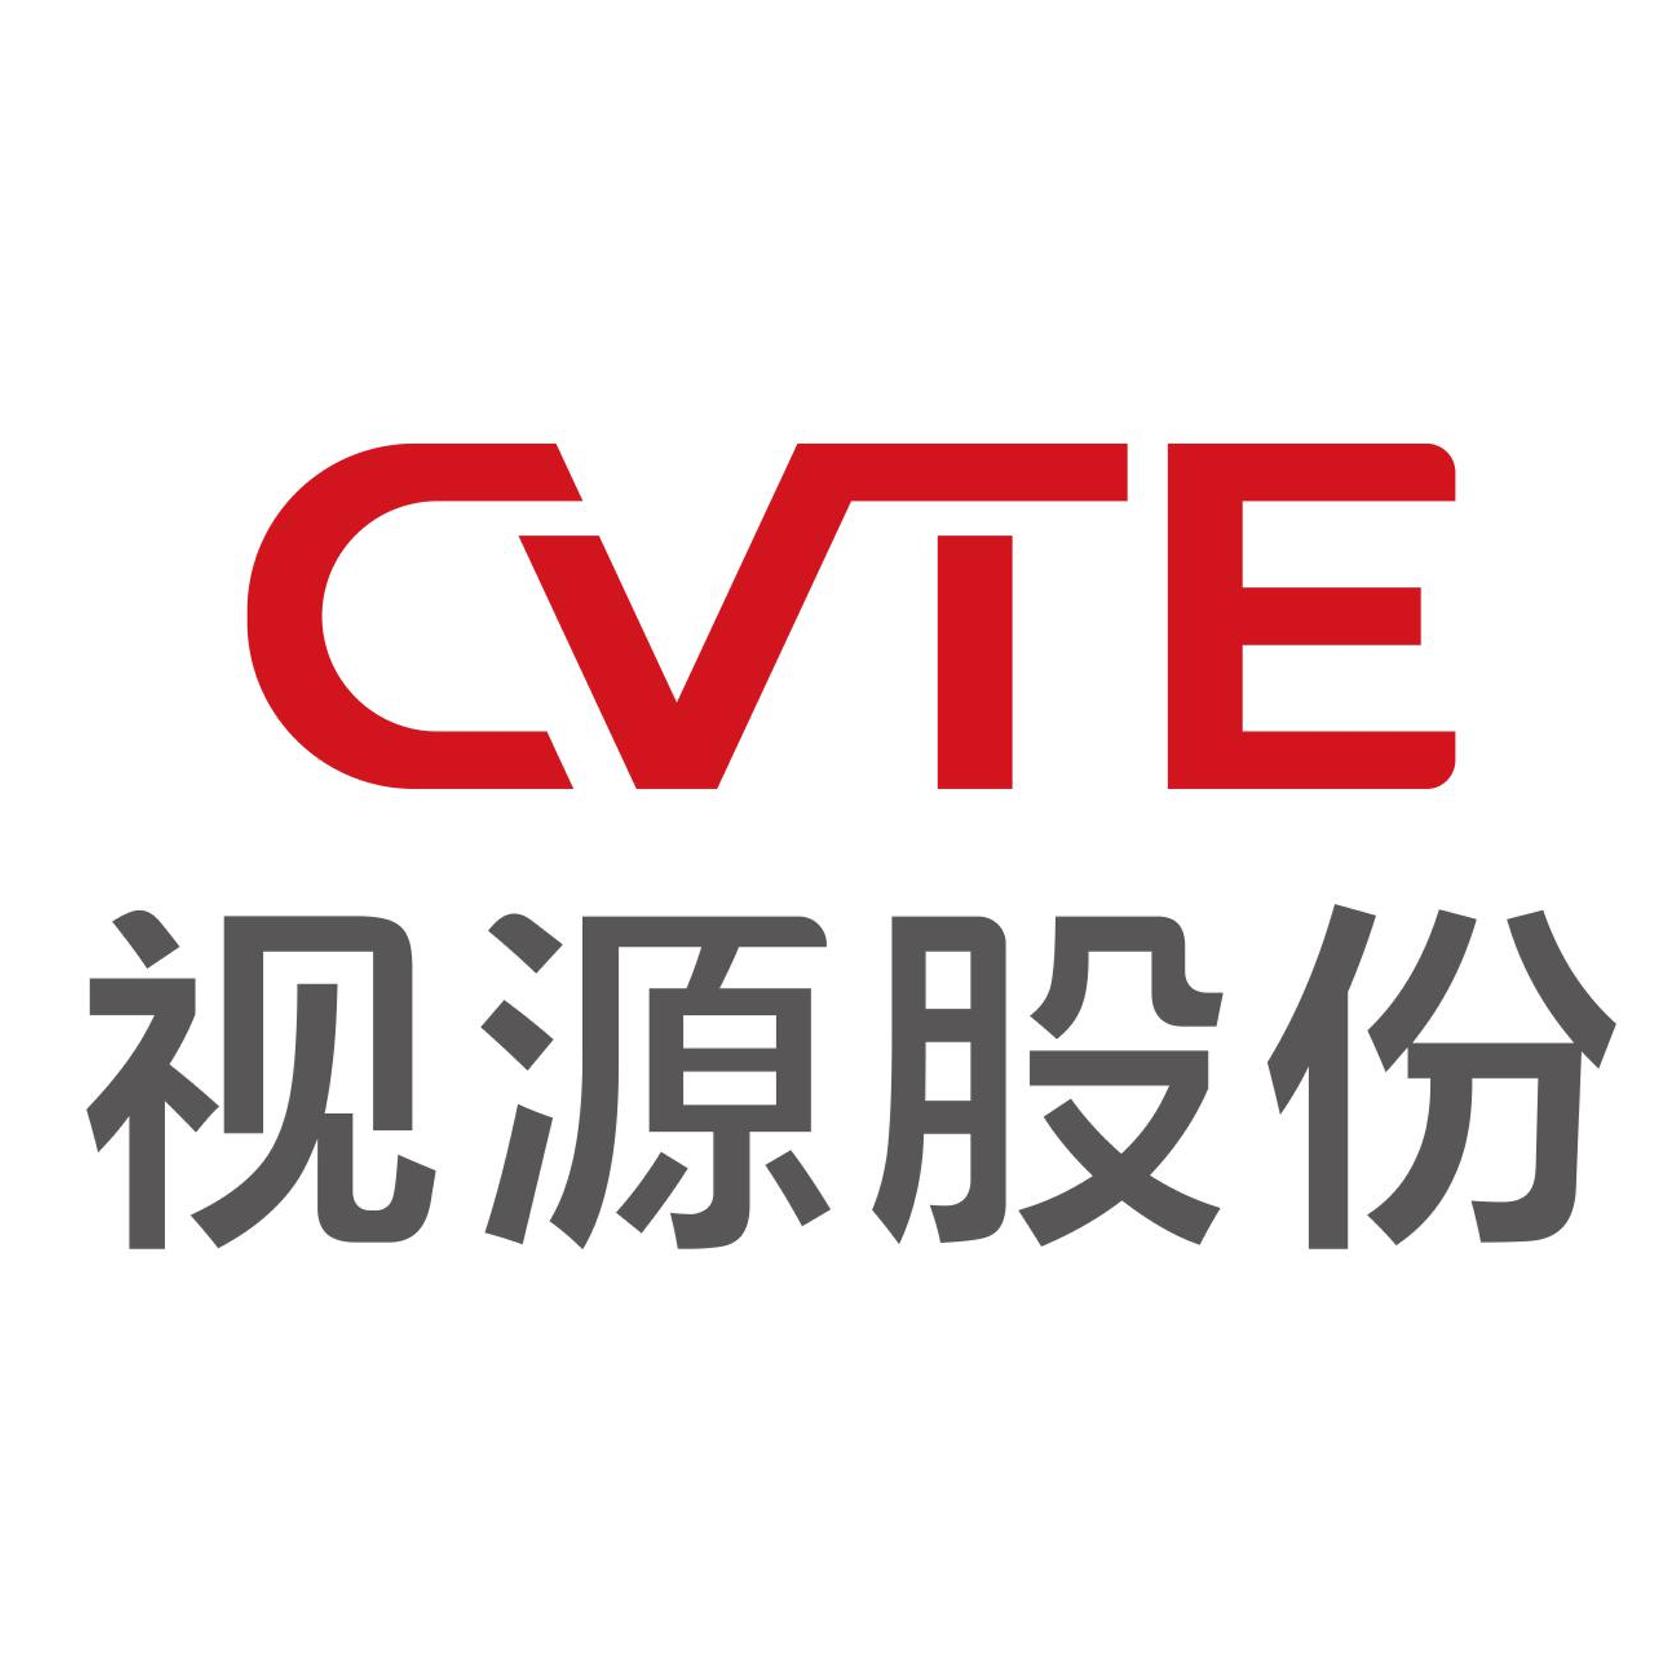 CVTE Logo